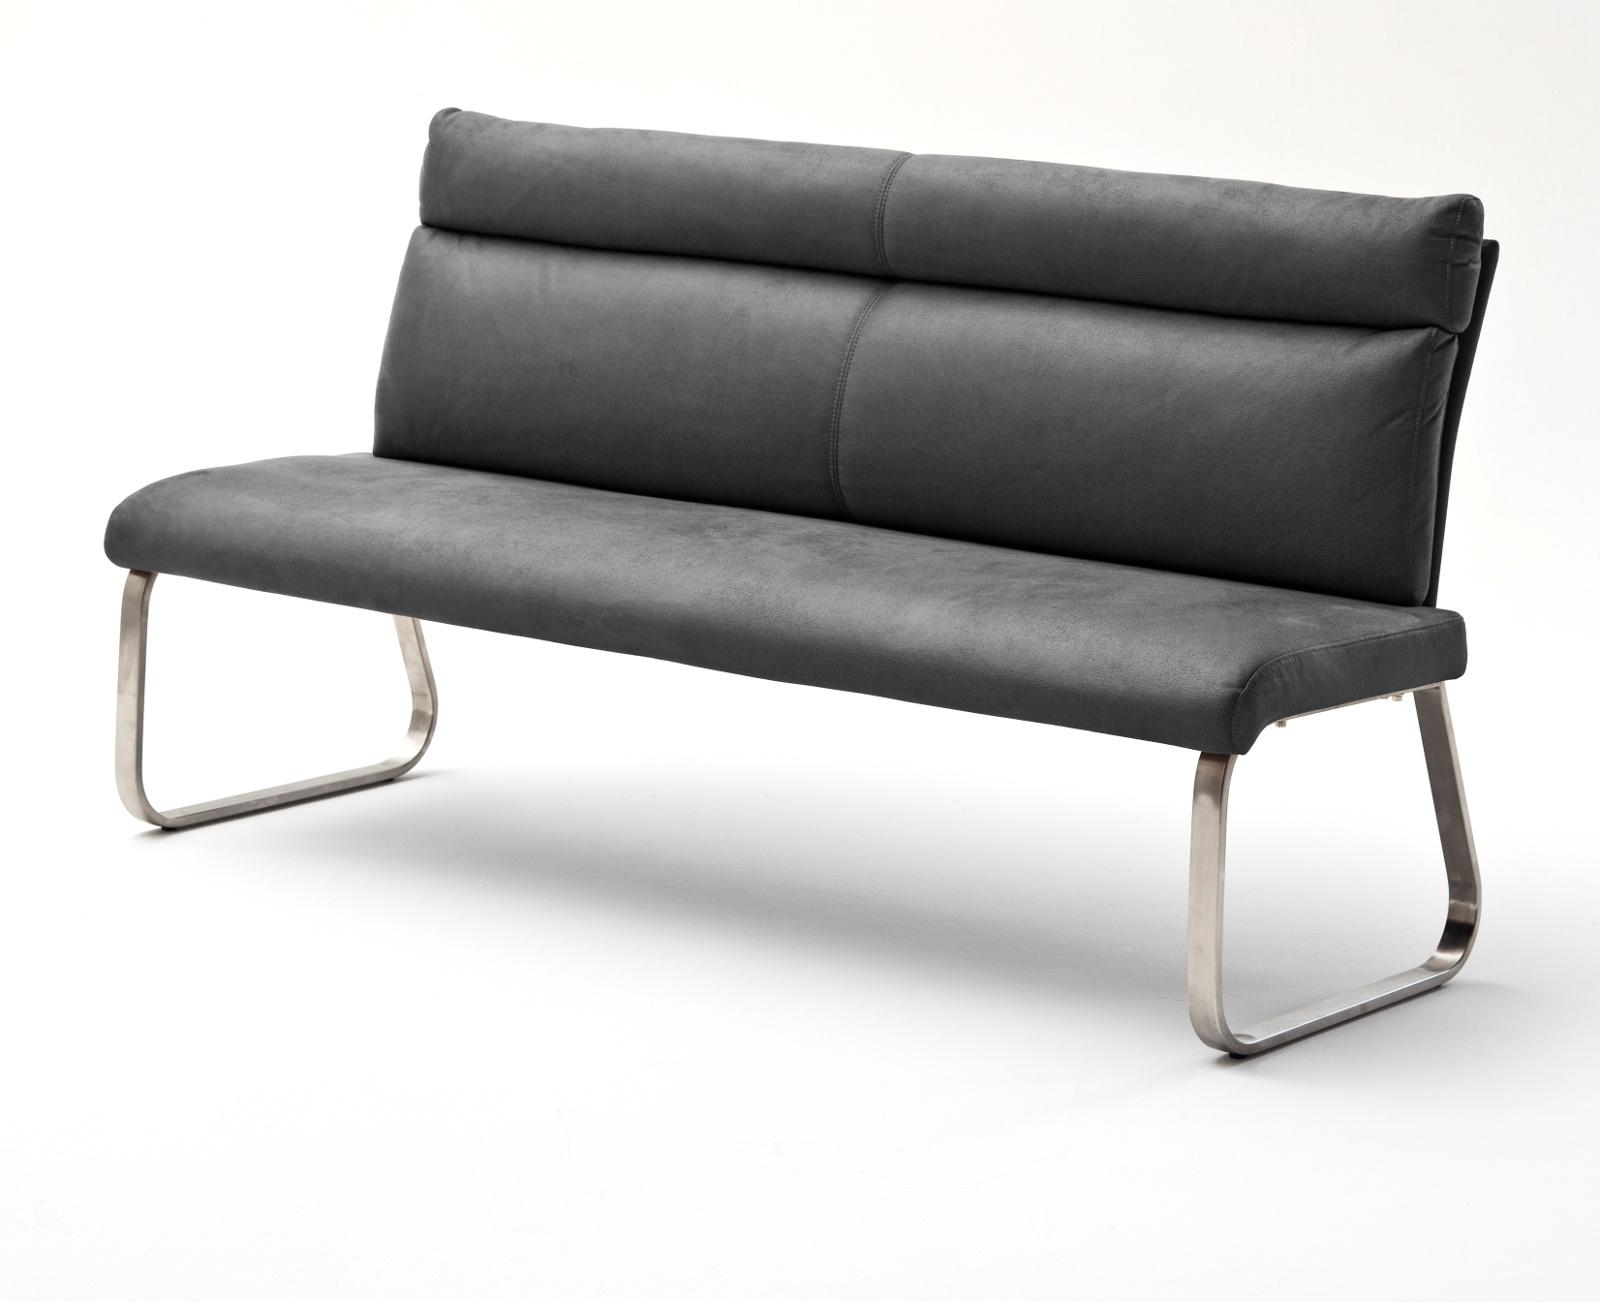 Sitzbank Rabea Grau Vintage 160 Cm